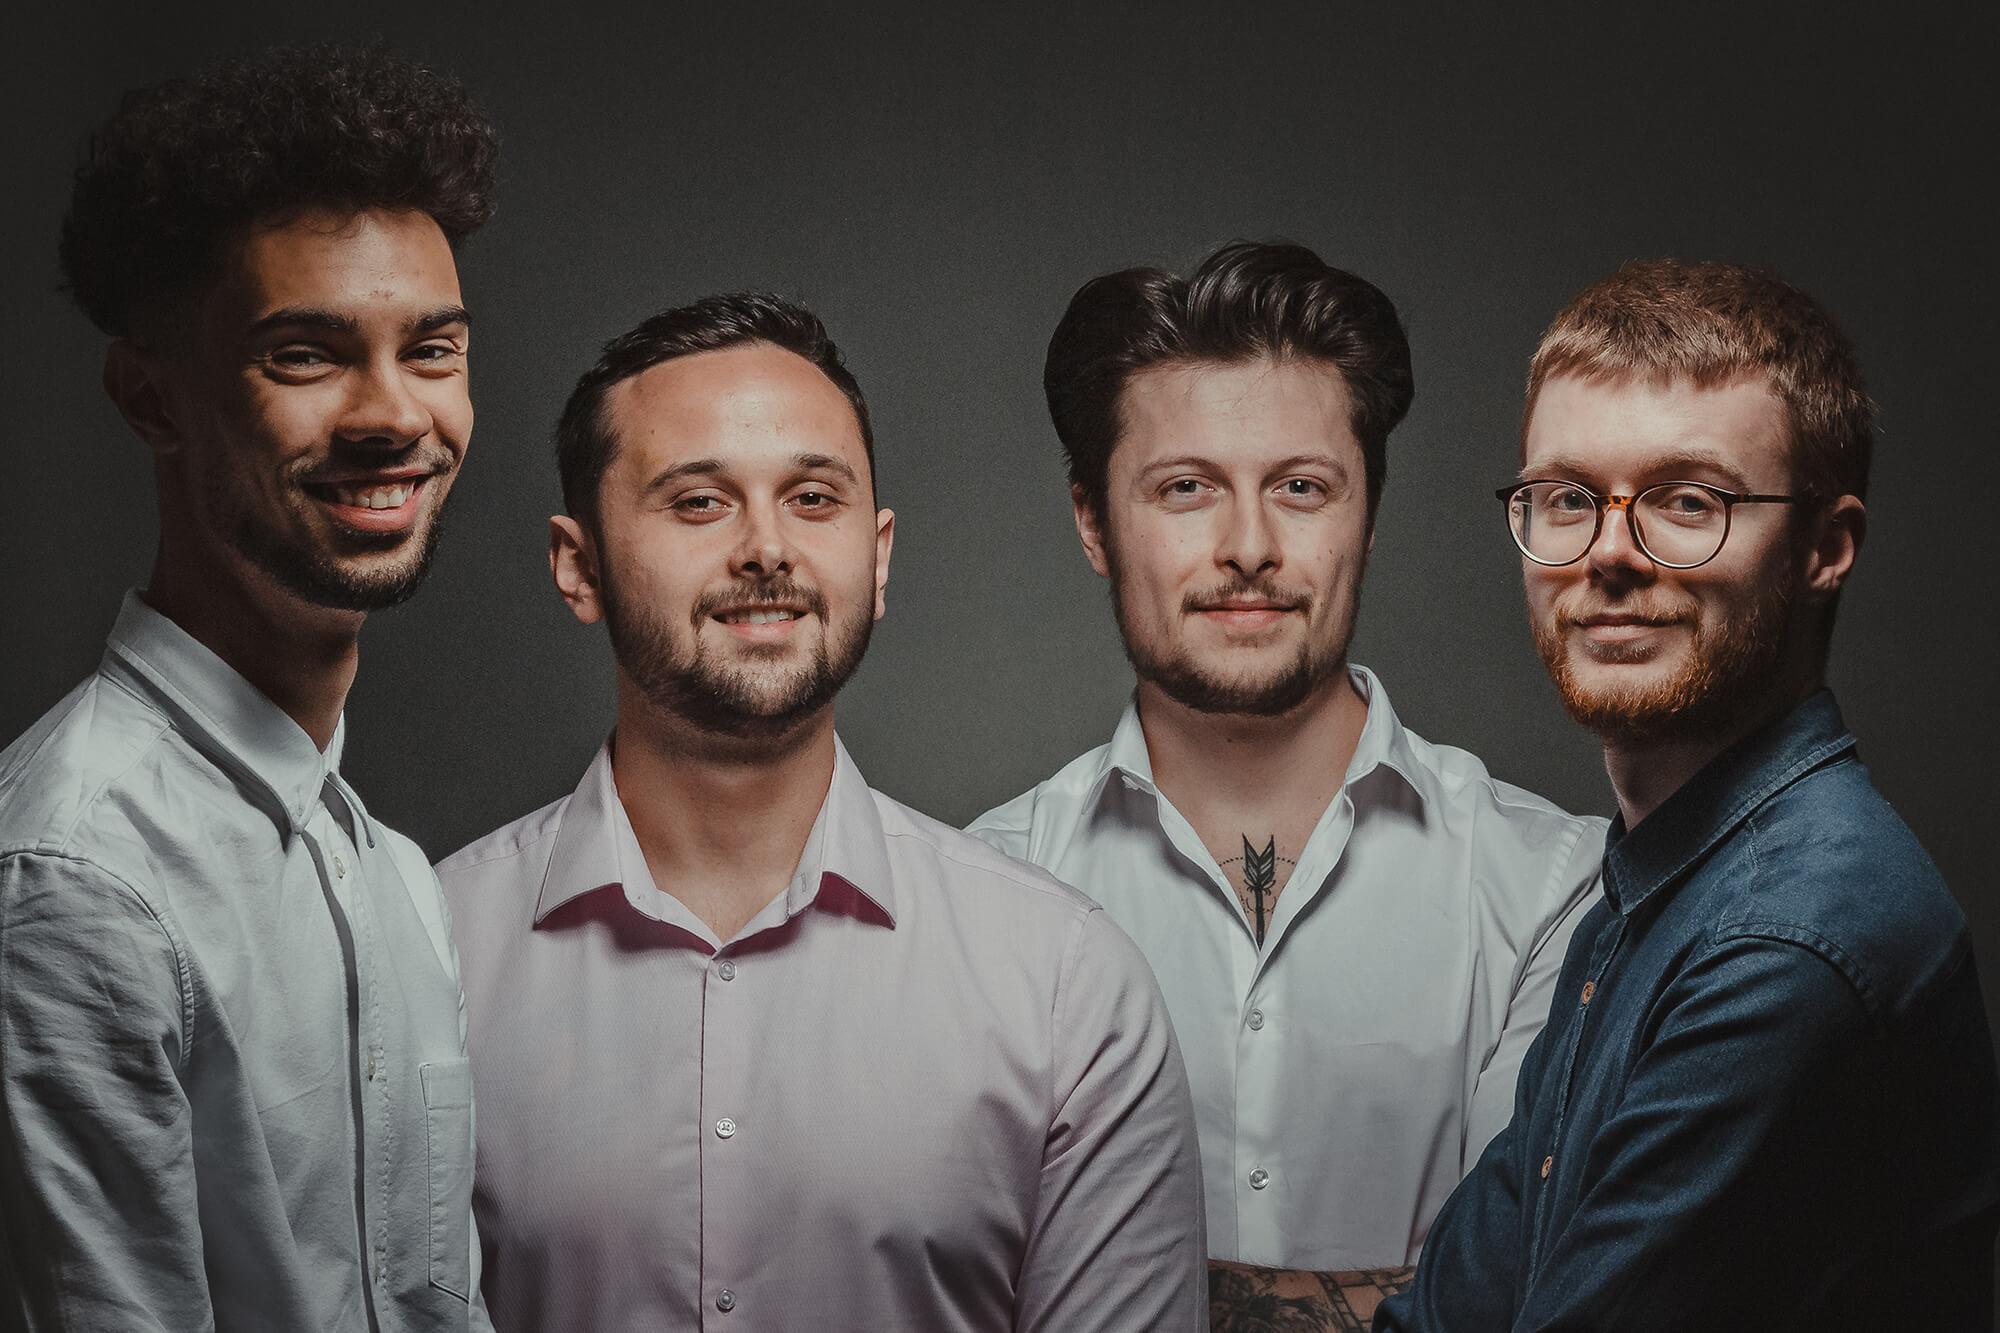 The Goldbox team: Odhran Taylor, James Heaney, Josh Spaticchia, and Ben Collison